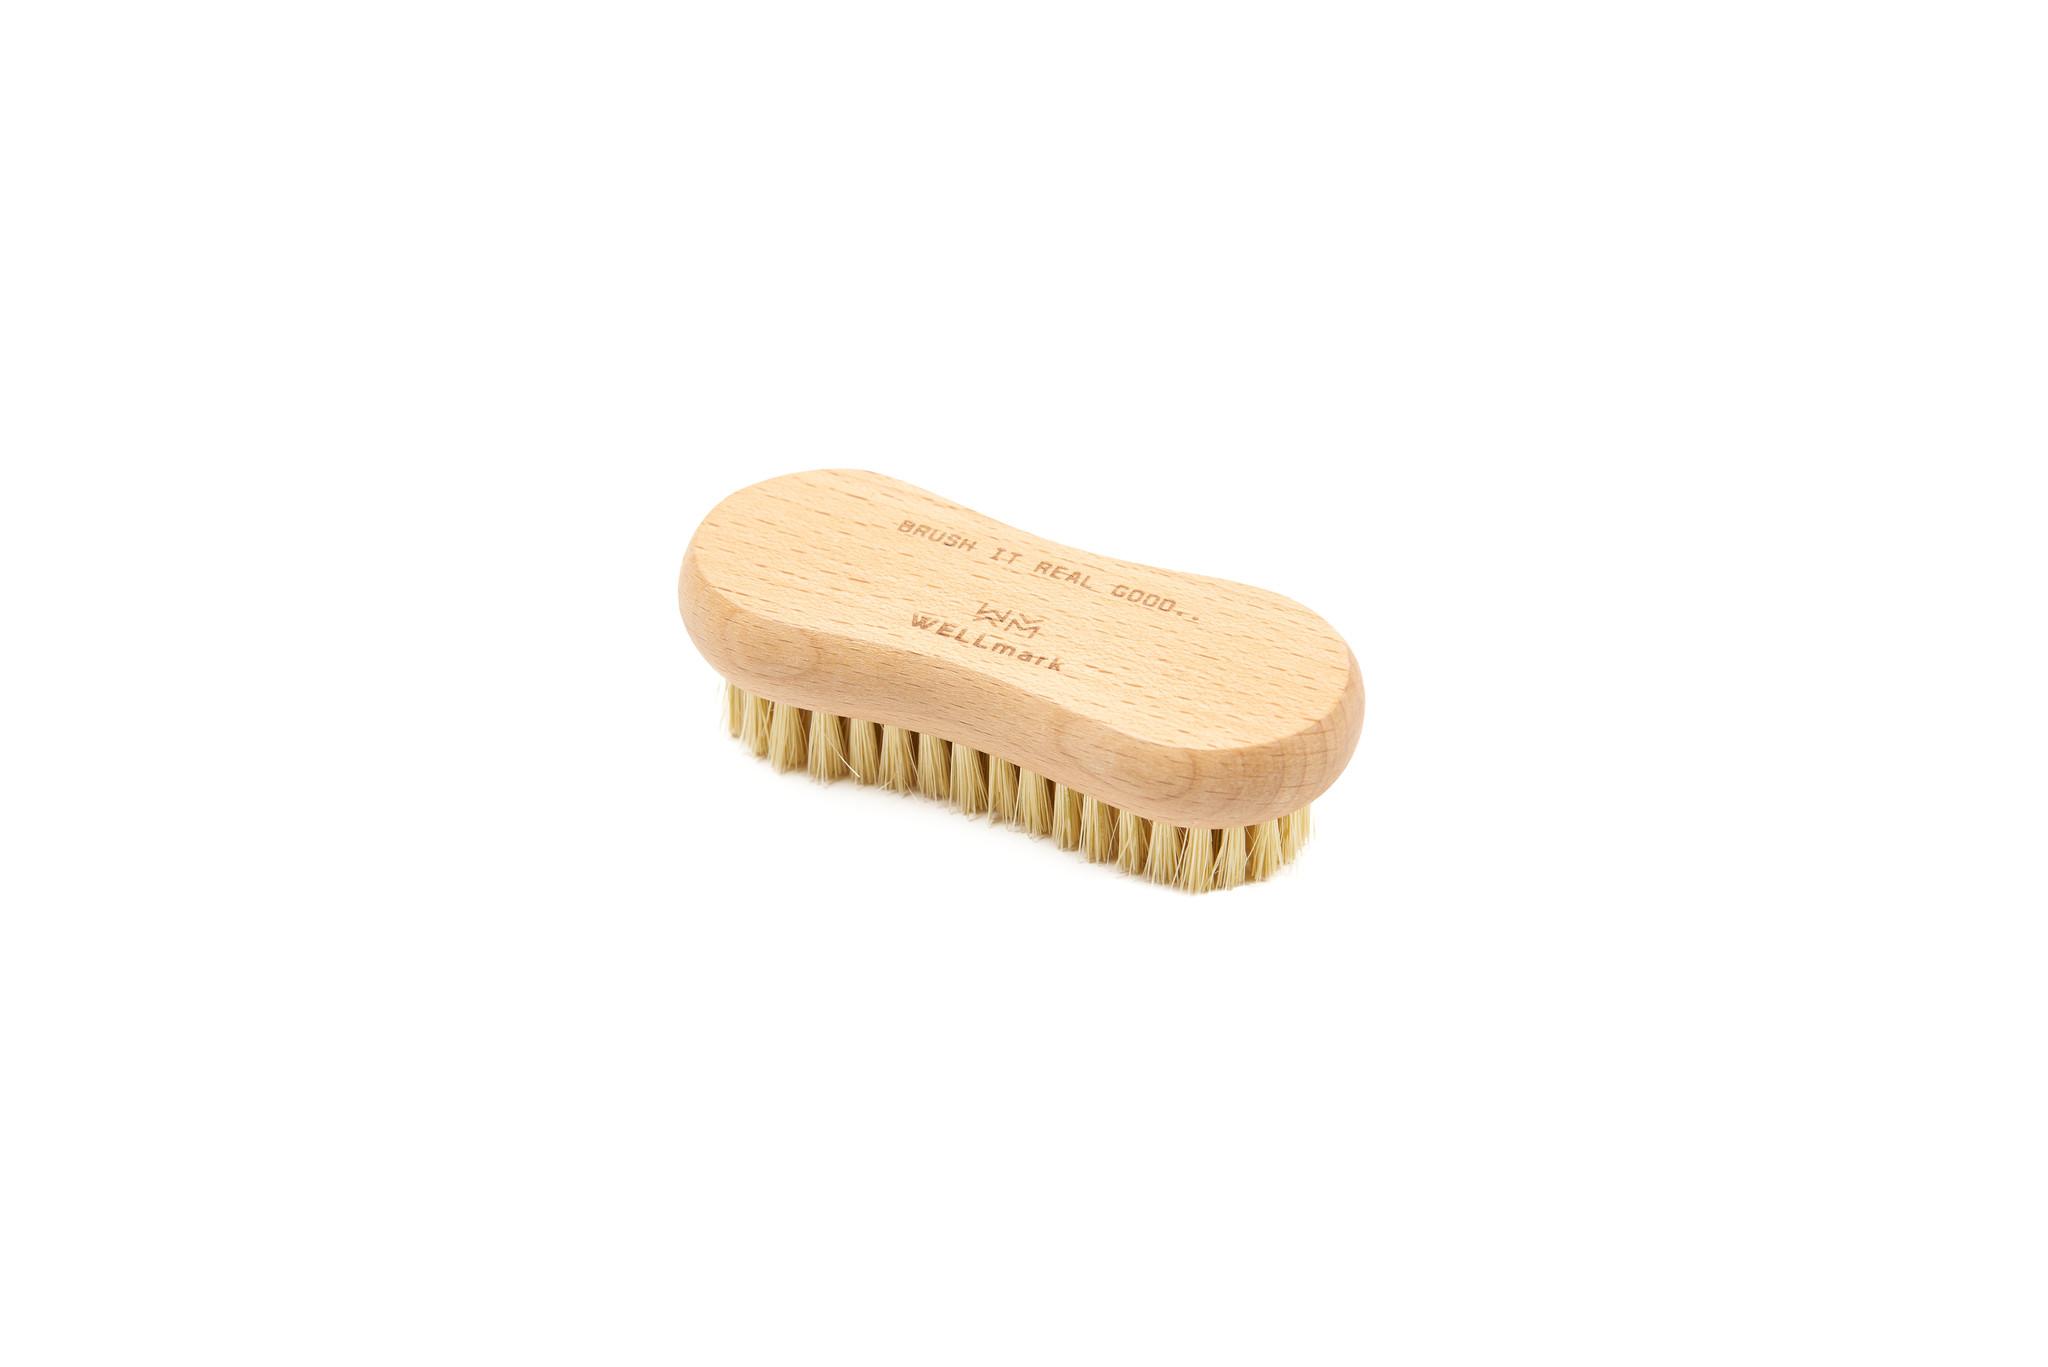 Nagelborstel 'clean nails clean mind'-1